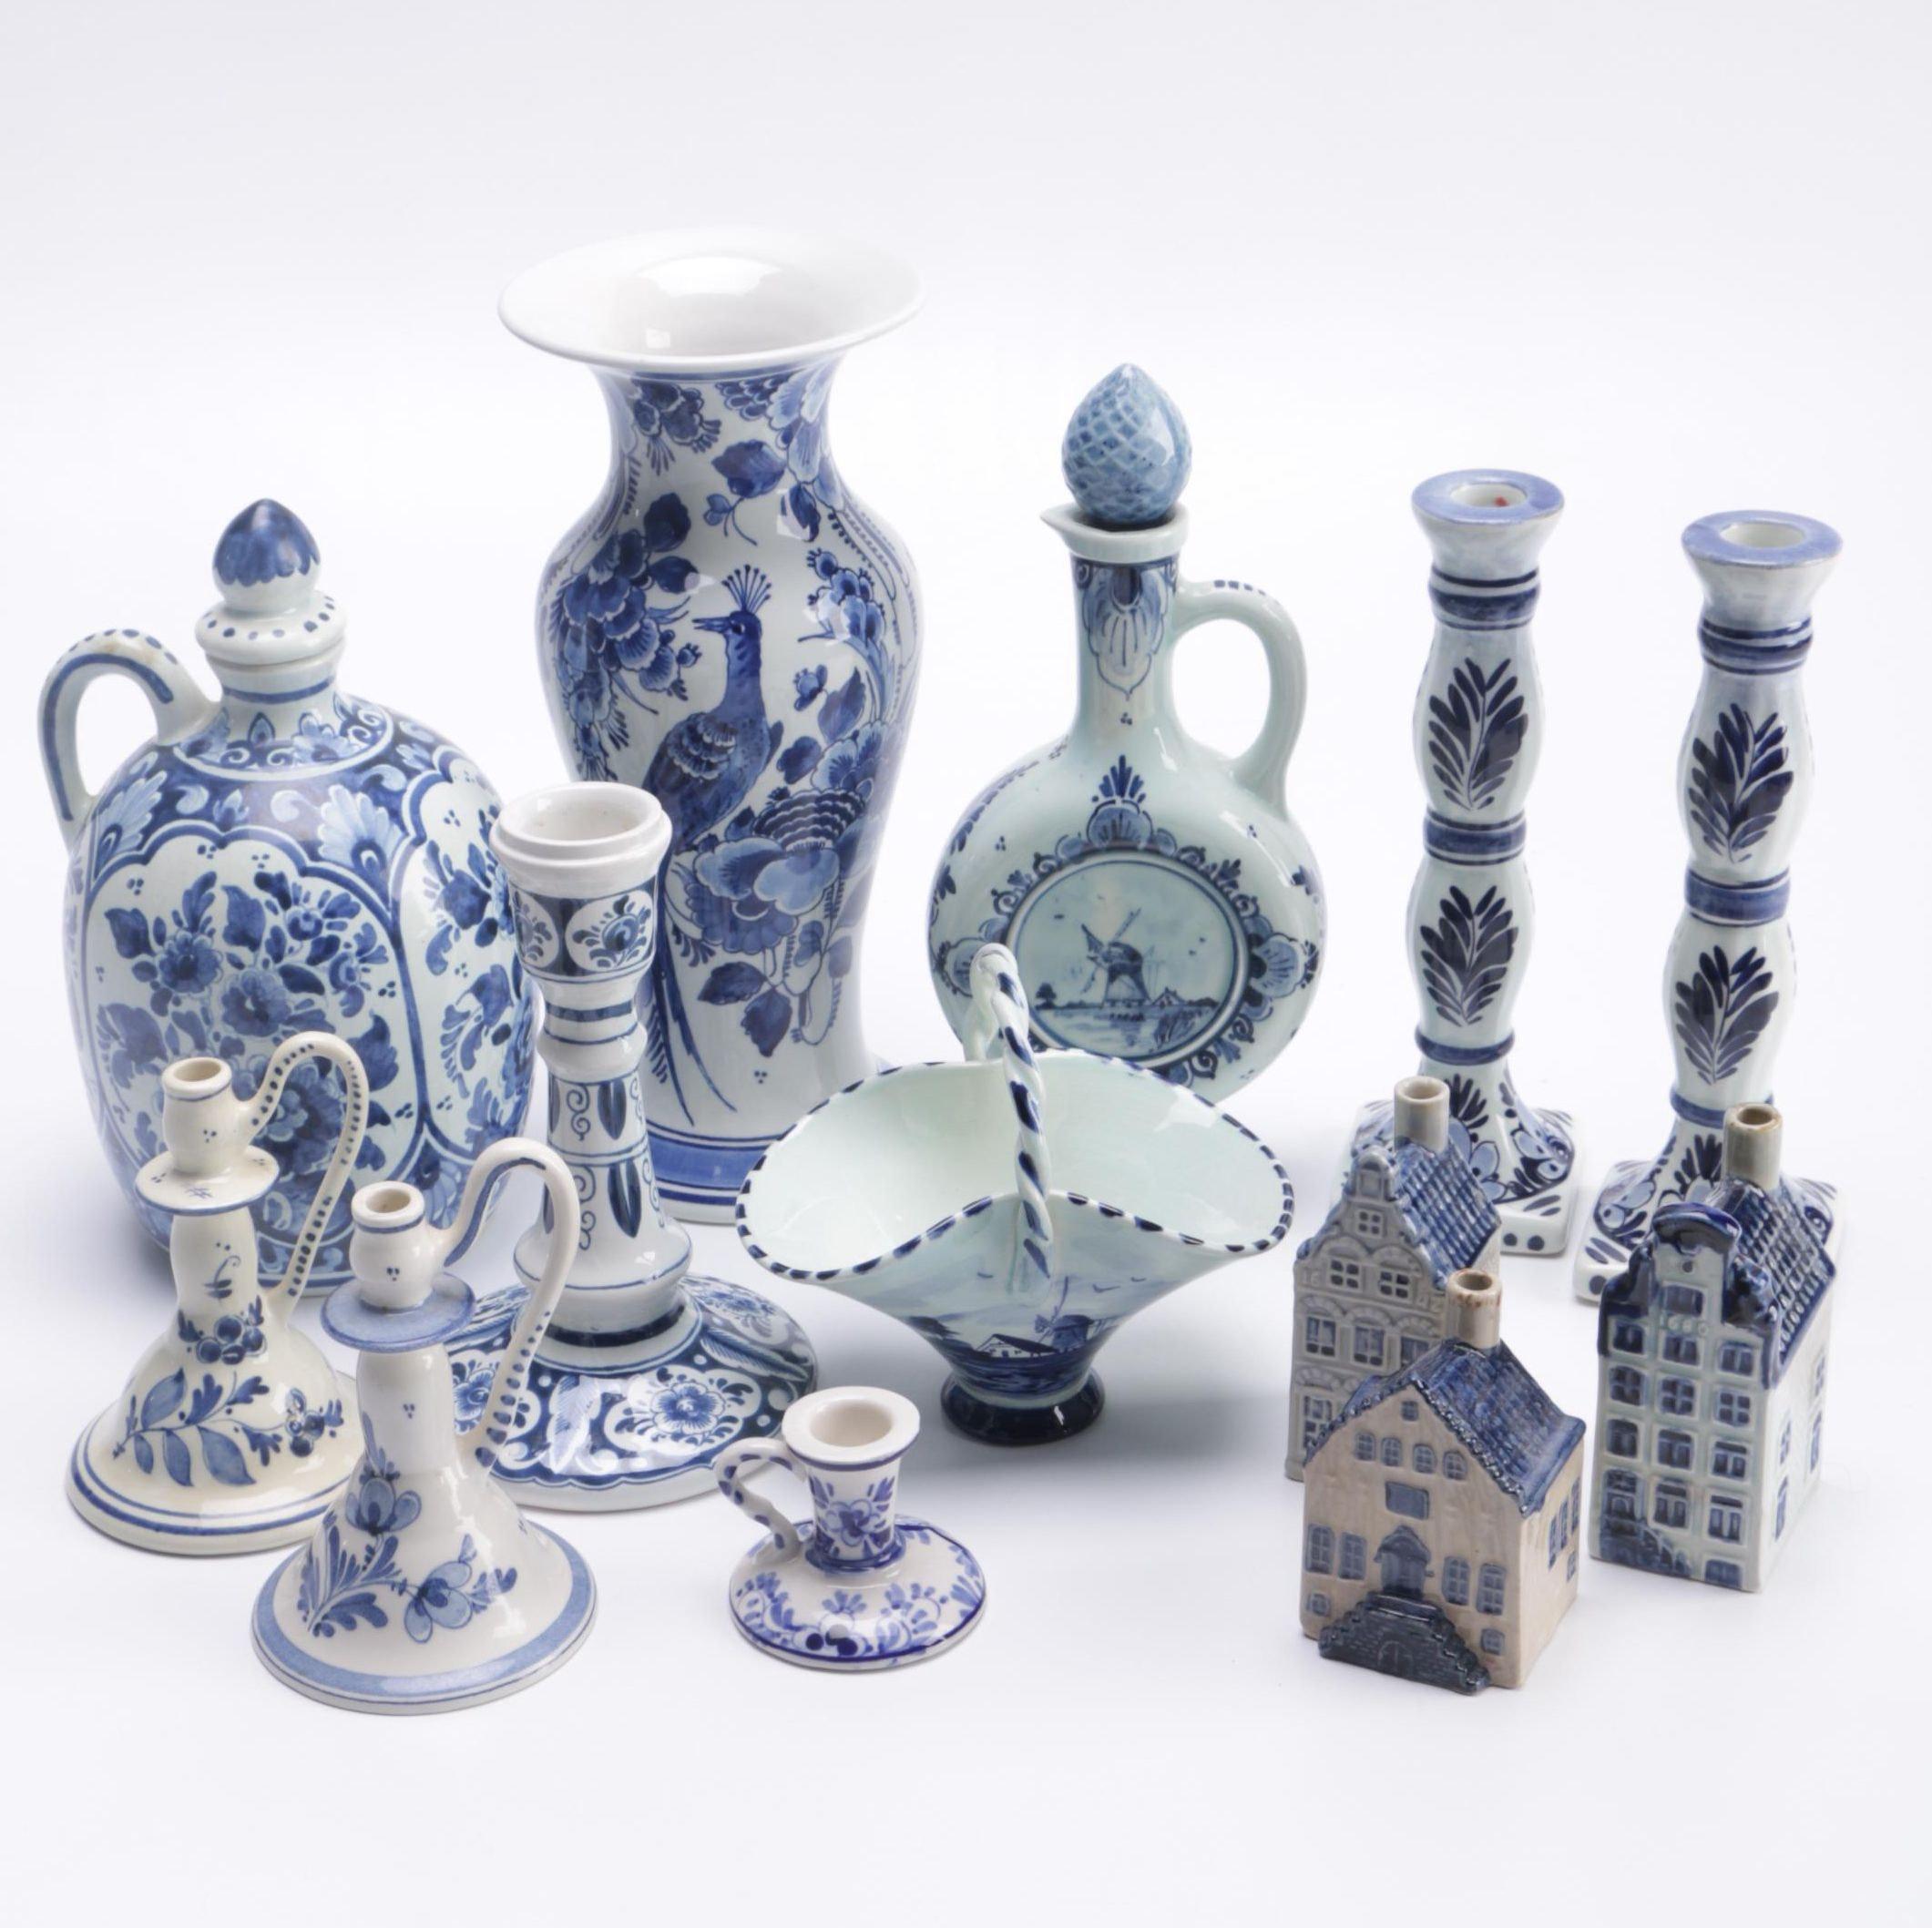 Assortment of Glazed Souvenir Delftware Décor